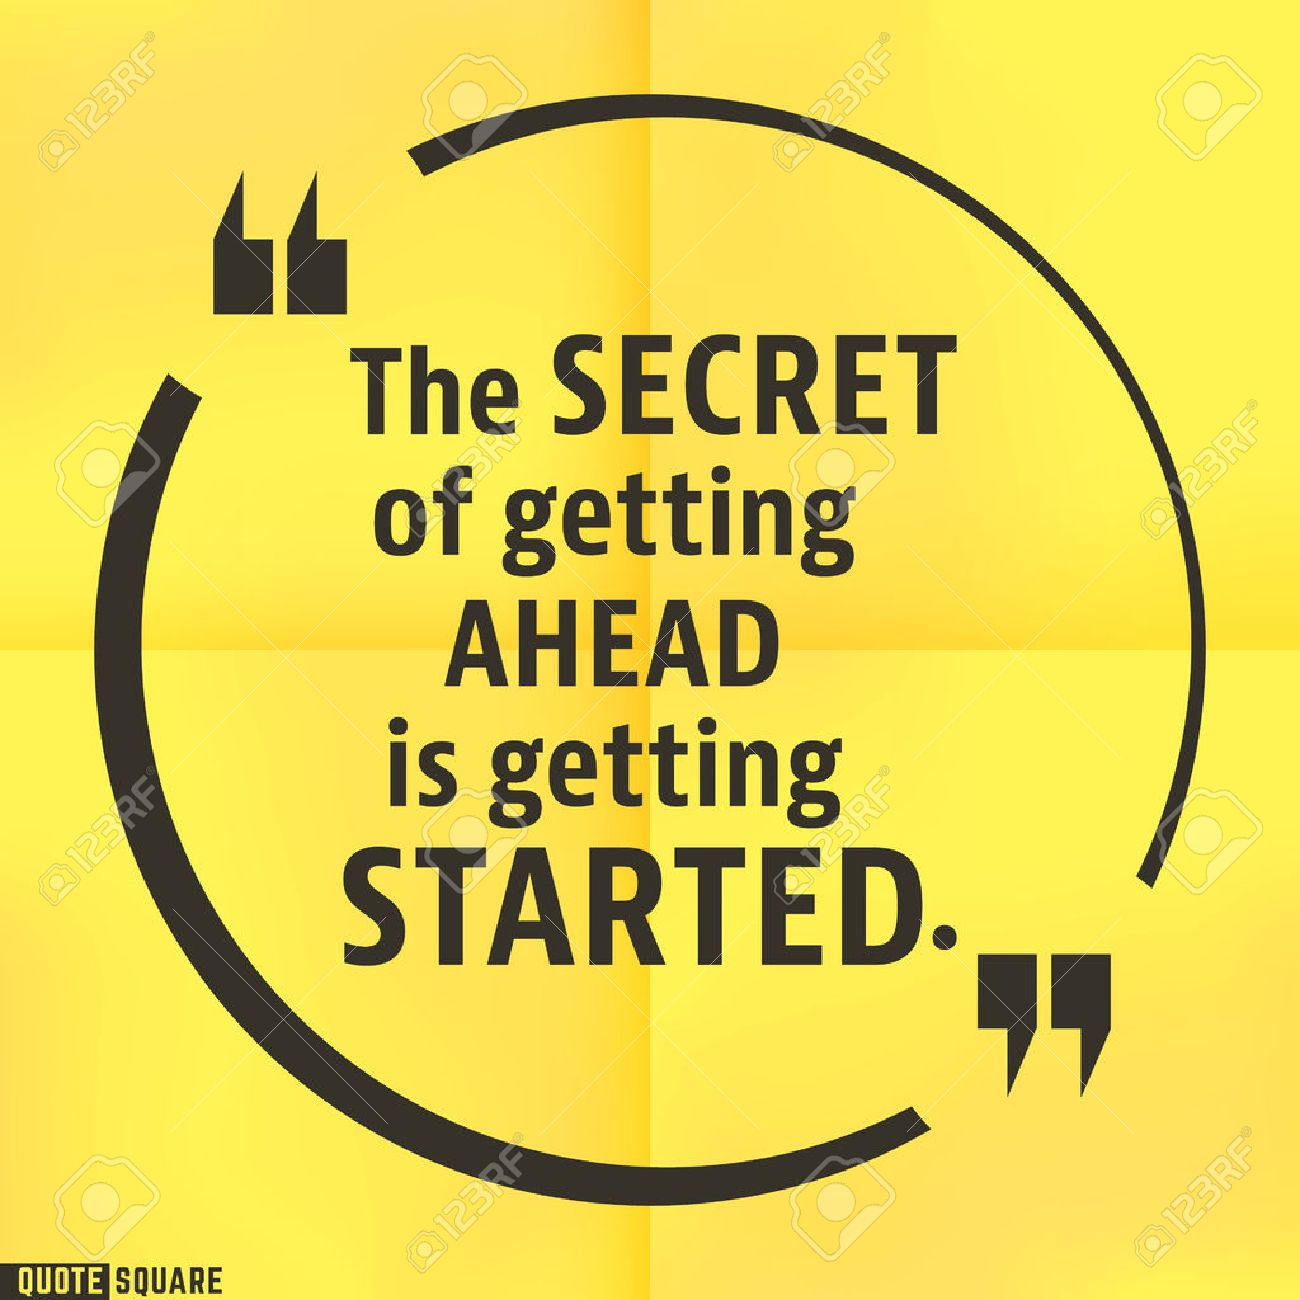 The Secret Quotes Quote Motivational Square Templateinspirational Quotes Bubble